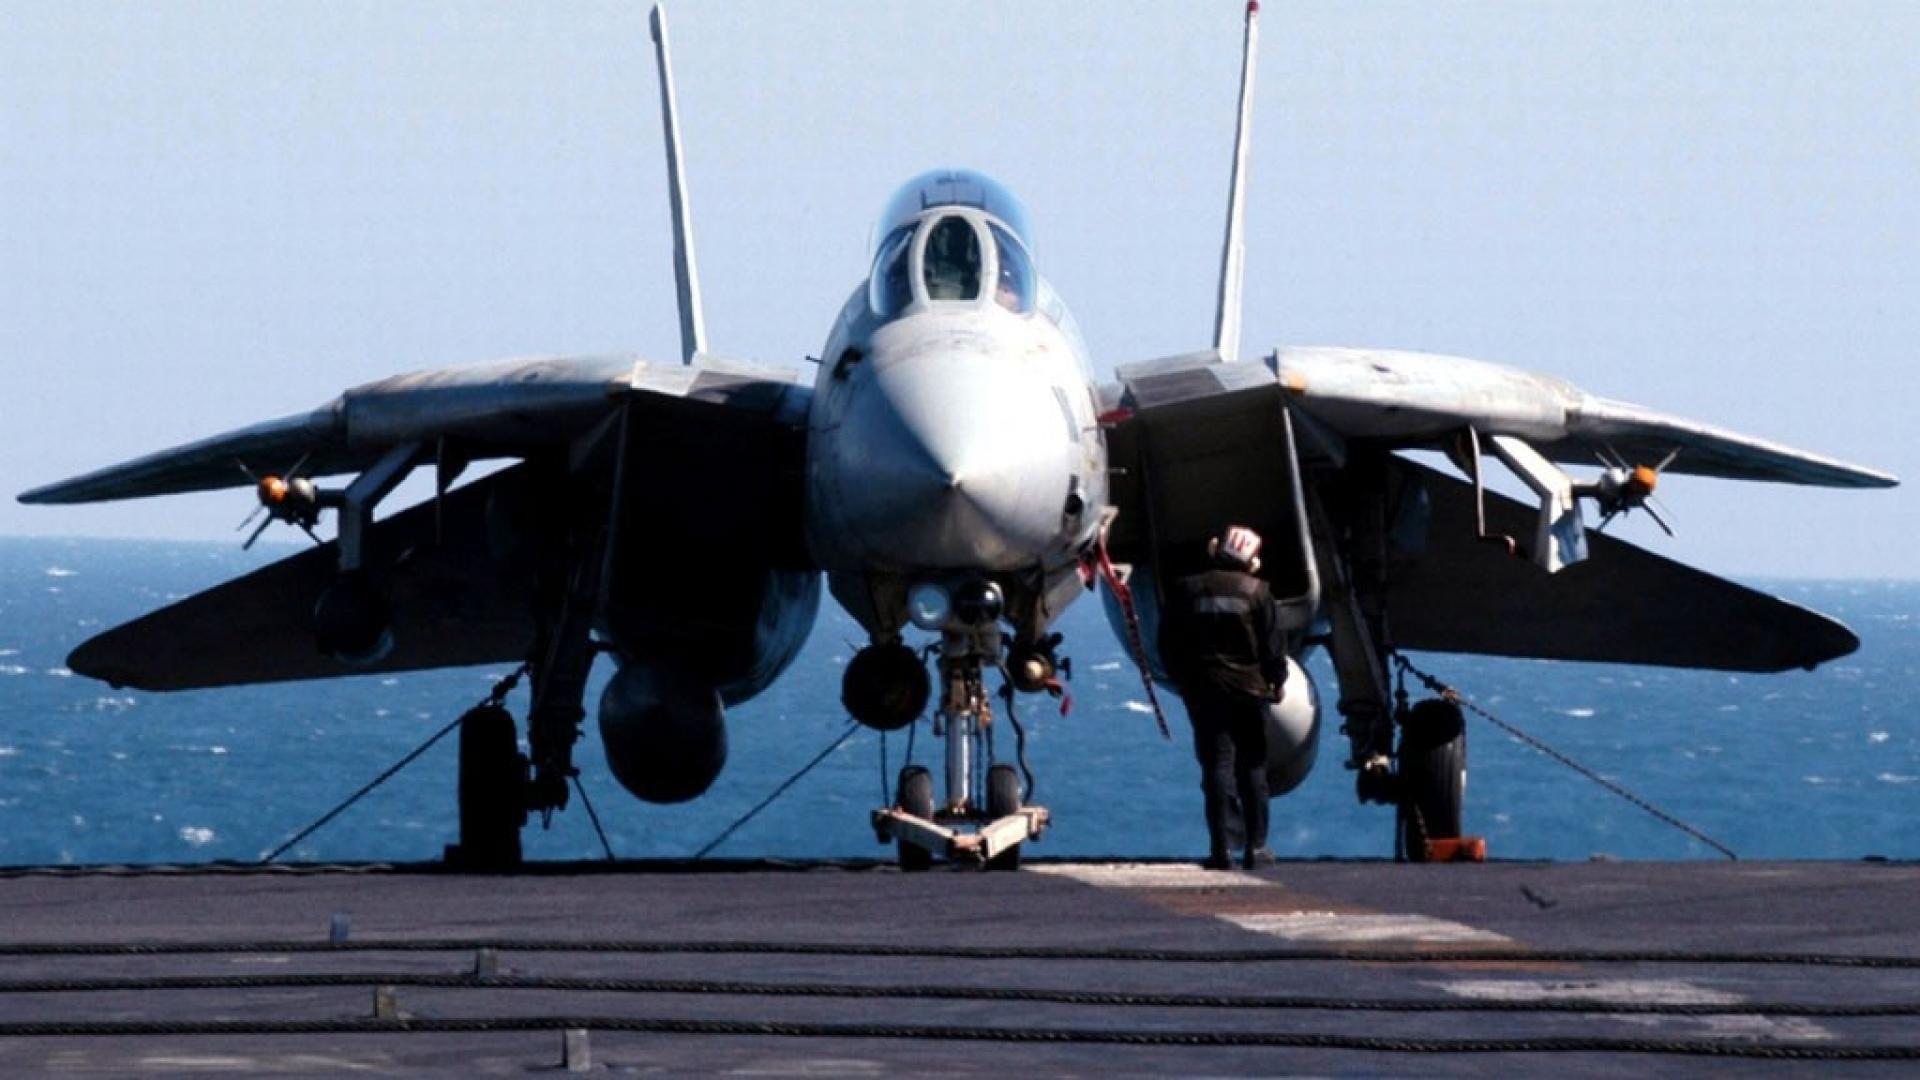 Res: 1920x1080, Flying over Phuket F-14 Tomcat [FSX HD] - YouTube